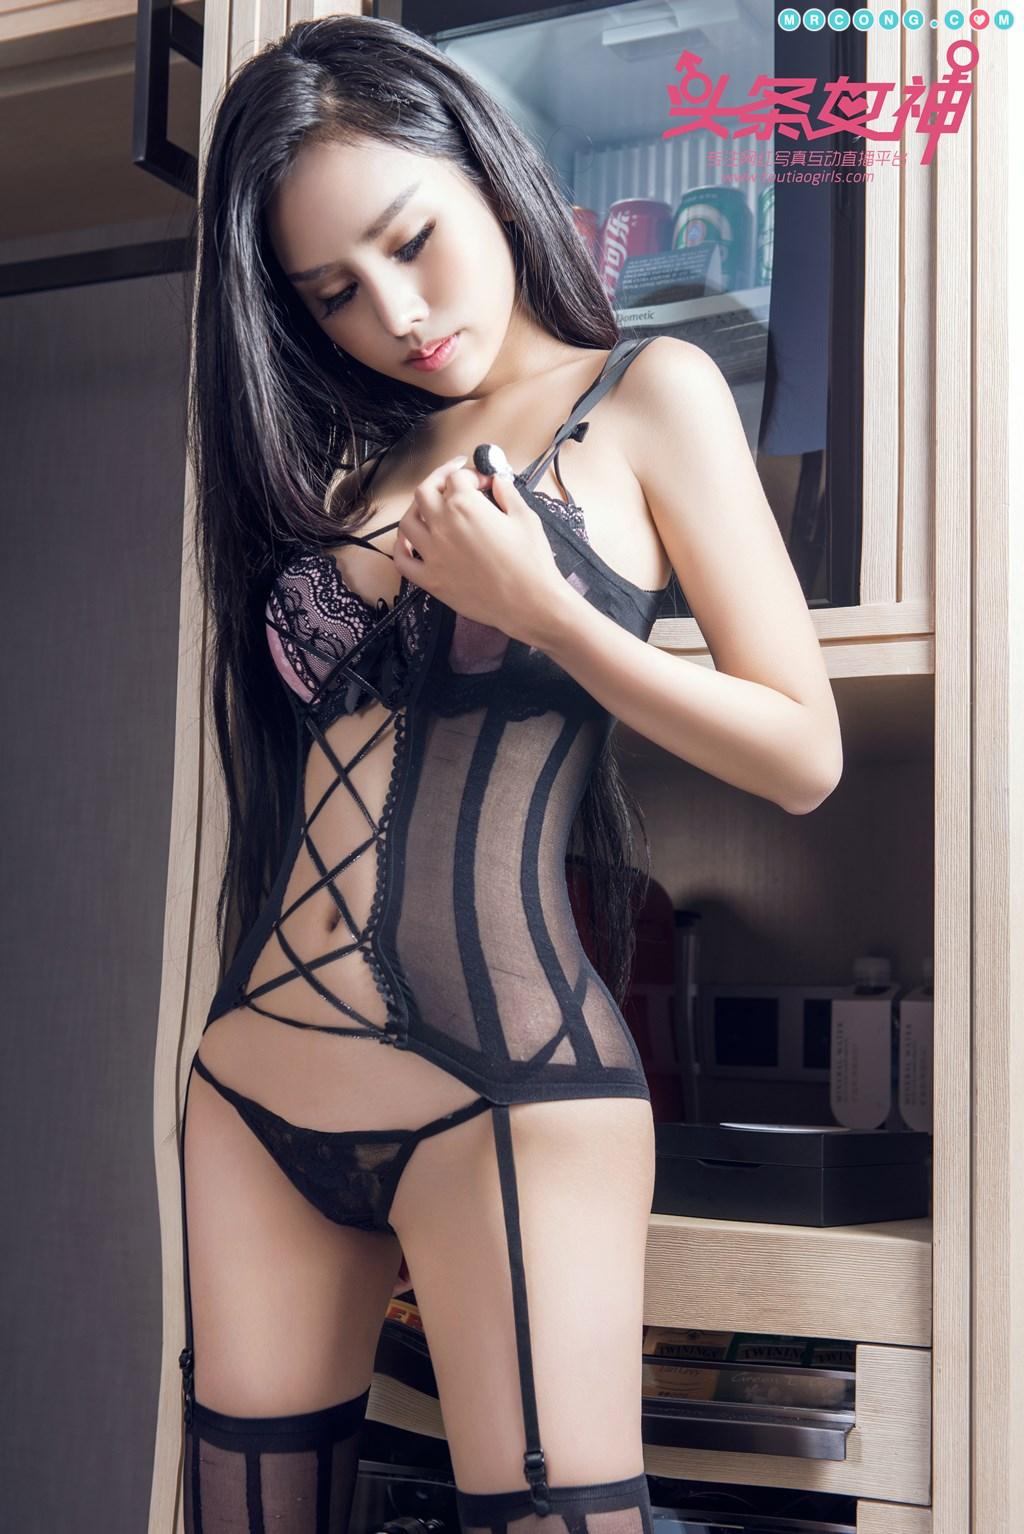 Image TouTiao-2017-12-05-Chen-Di-Ya-MrCong.com-004 in post TouTiao 2017-12-05: Người mẫu Chen Di Ya (陈迪垭) (35 ảnh)